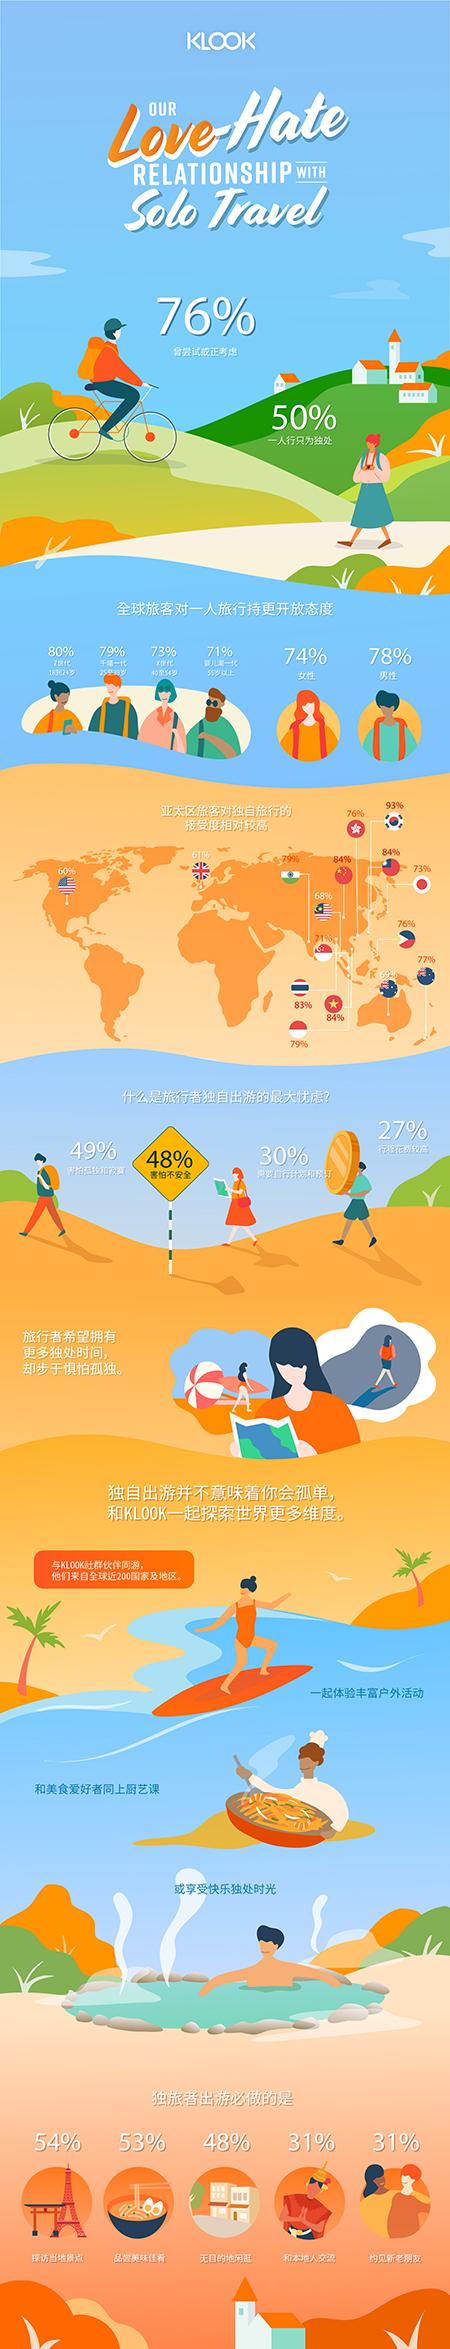 YouGov:2019年全球獨旅者趨勢?近五成國內旅客曾一人游_中國